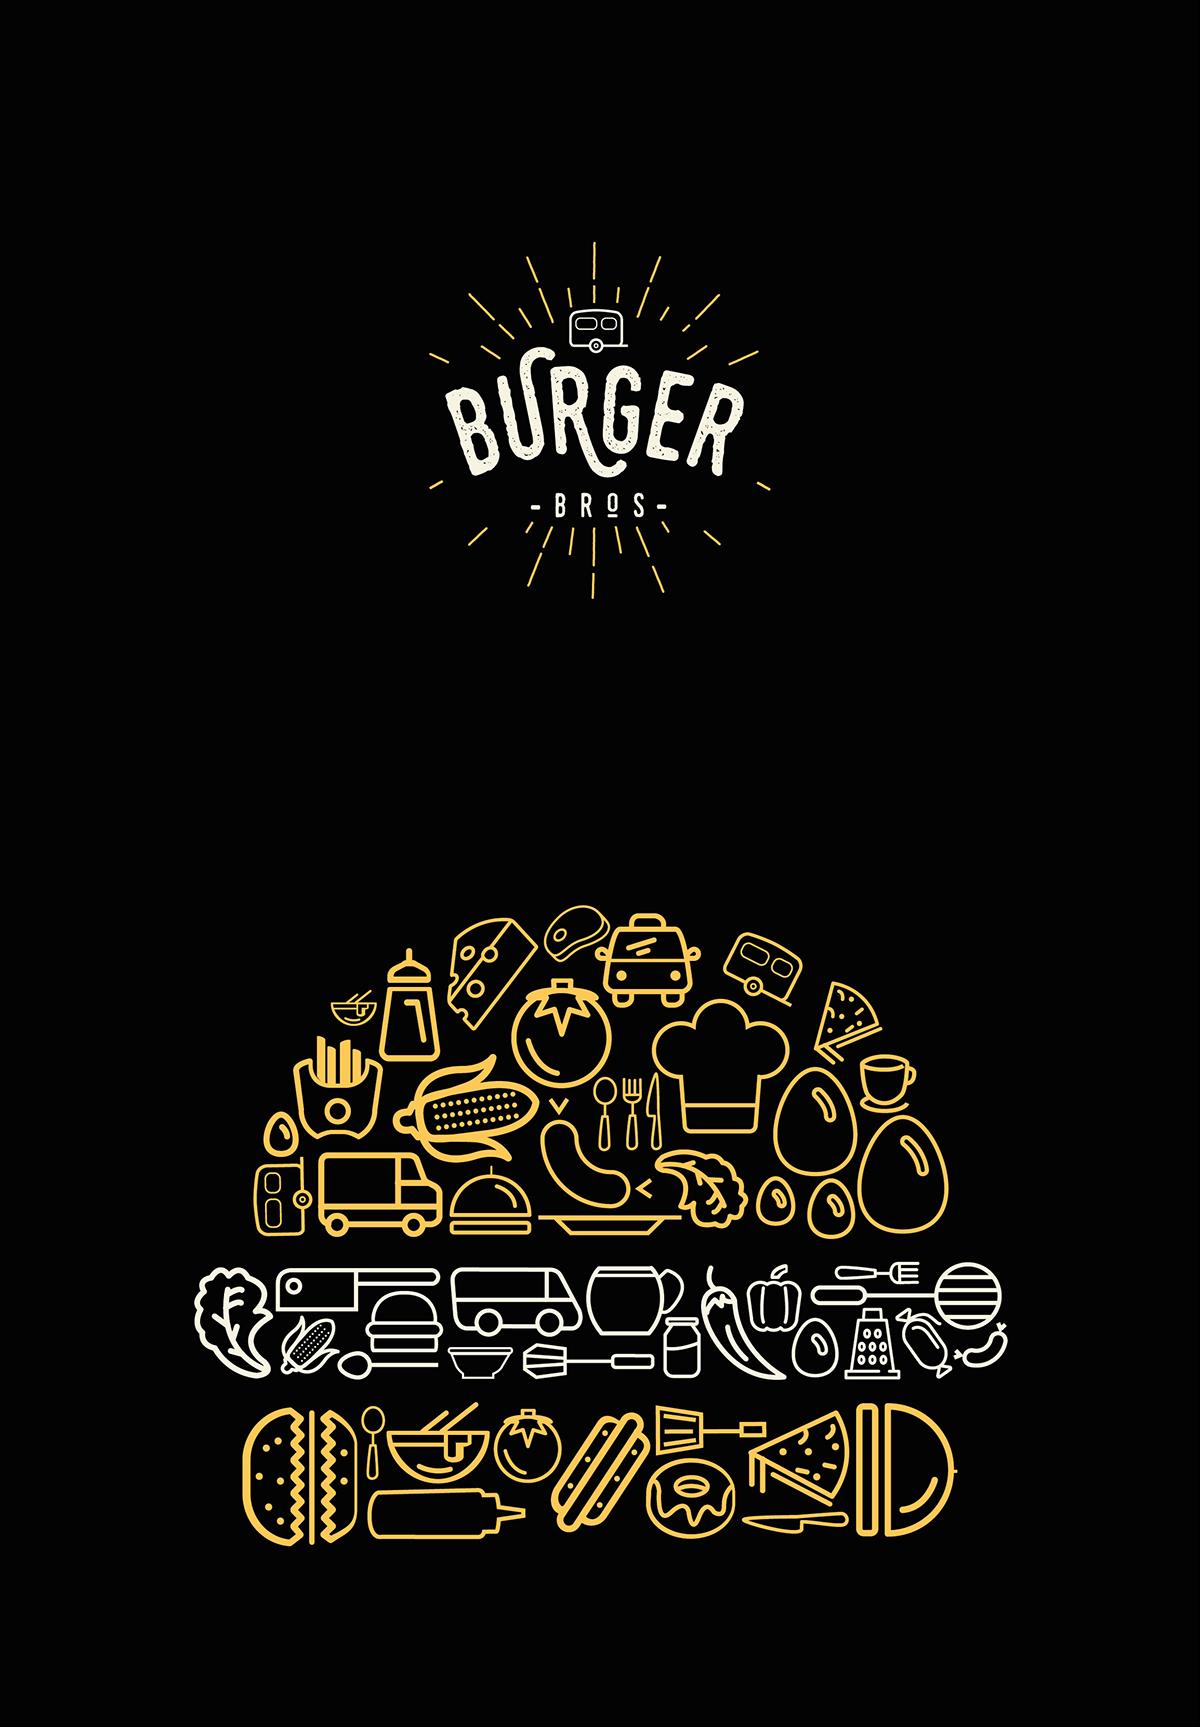 Tipografia La Imagen De La Hamburguesa Compuesta Por Diferentes